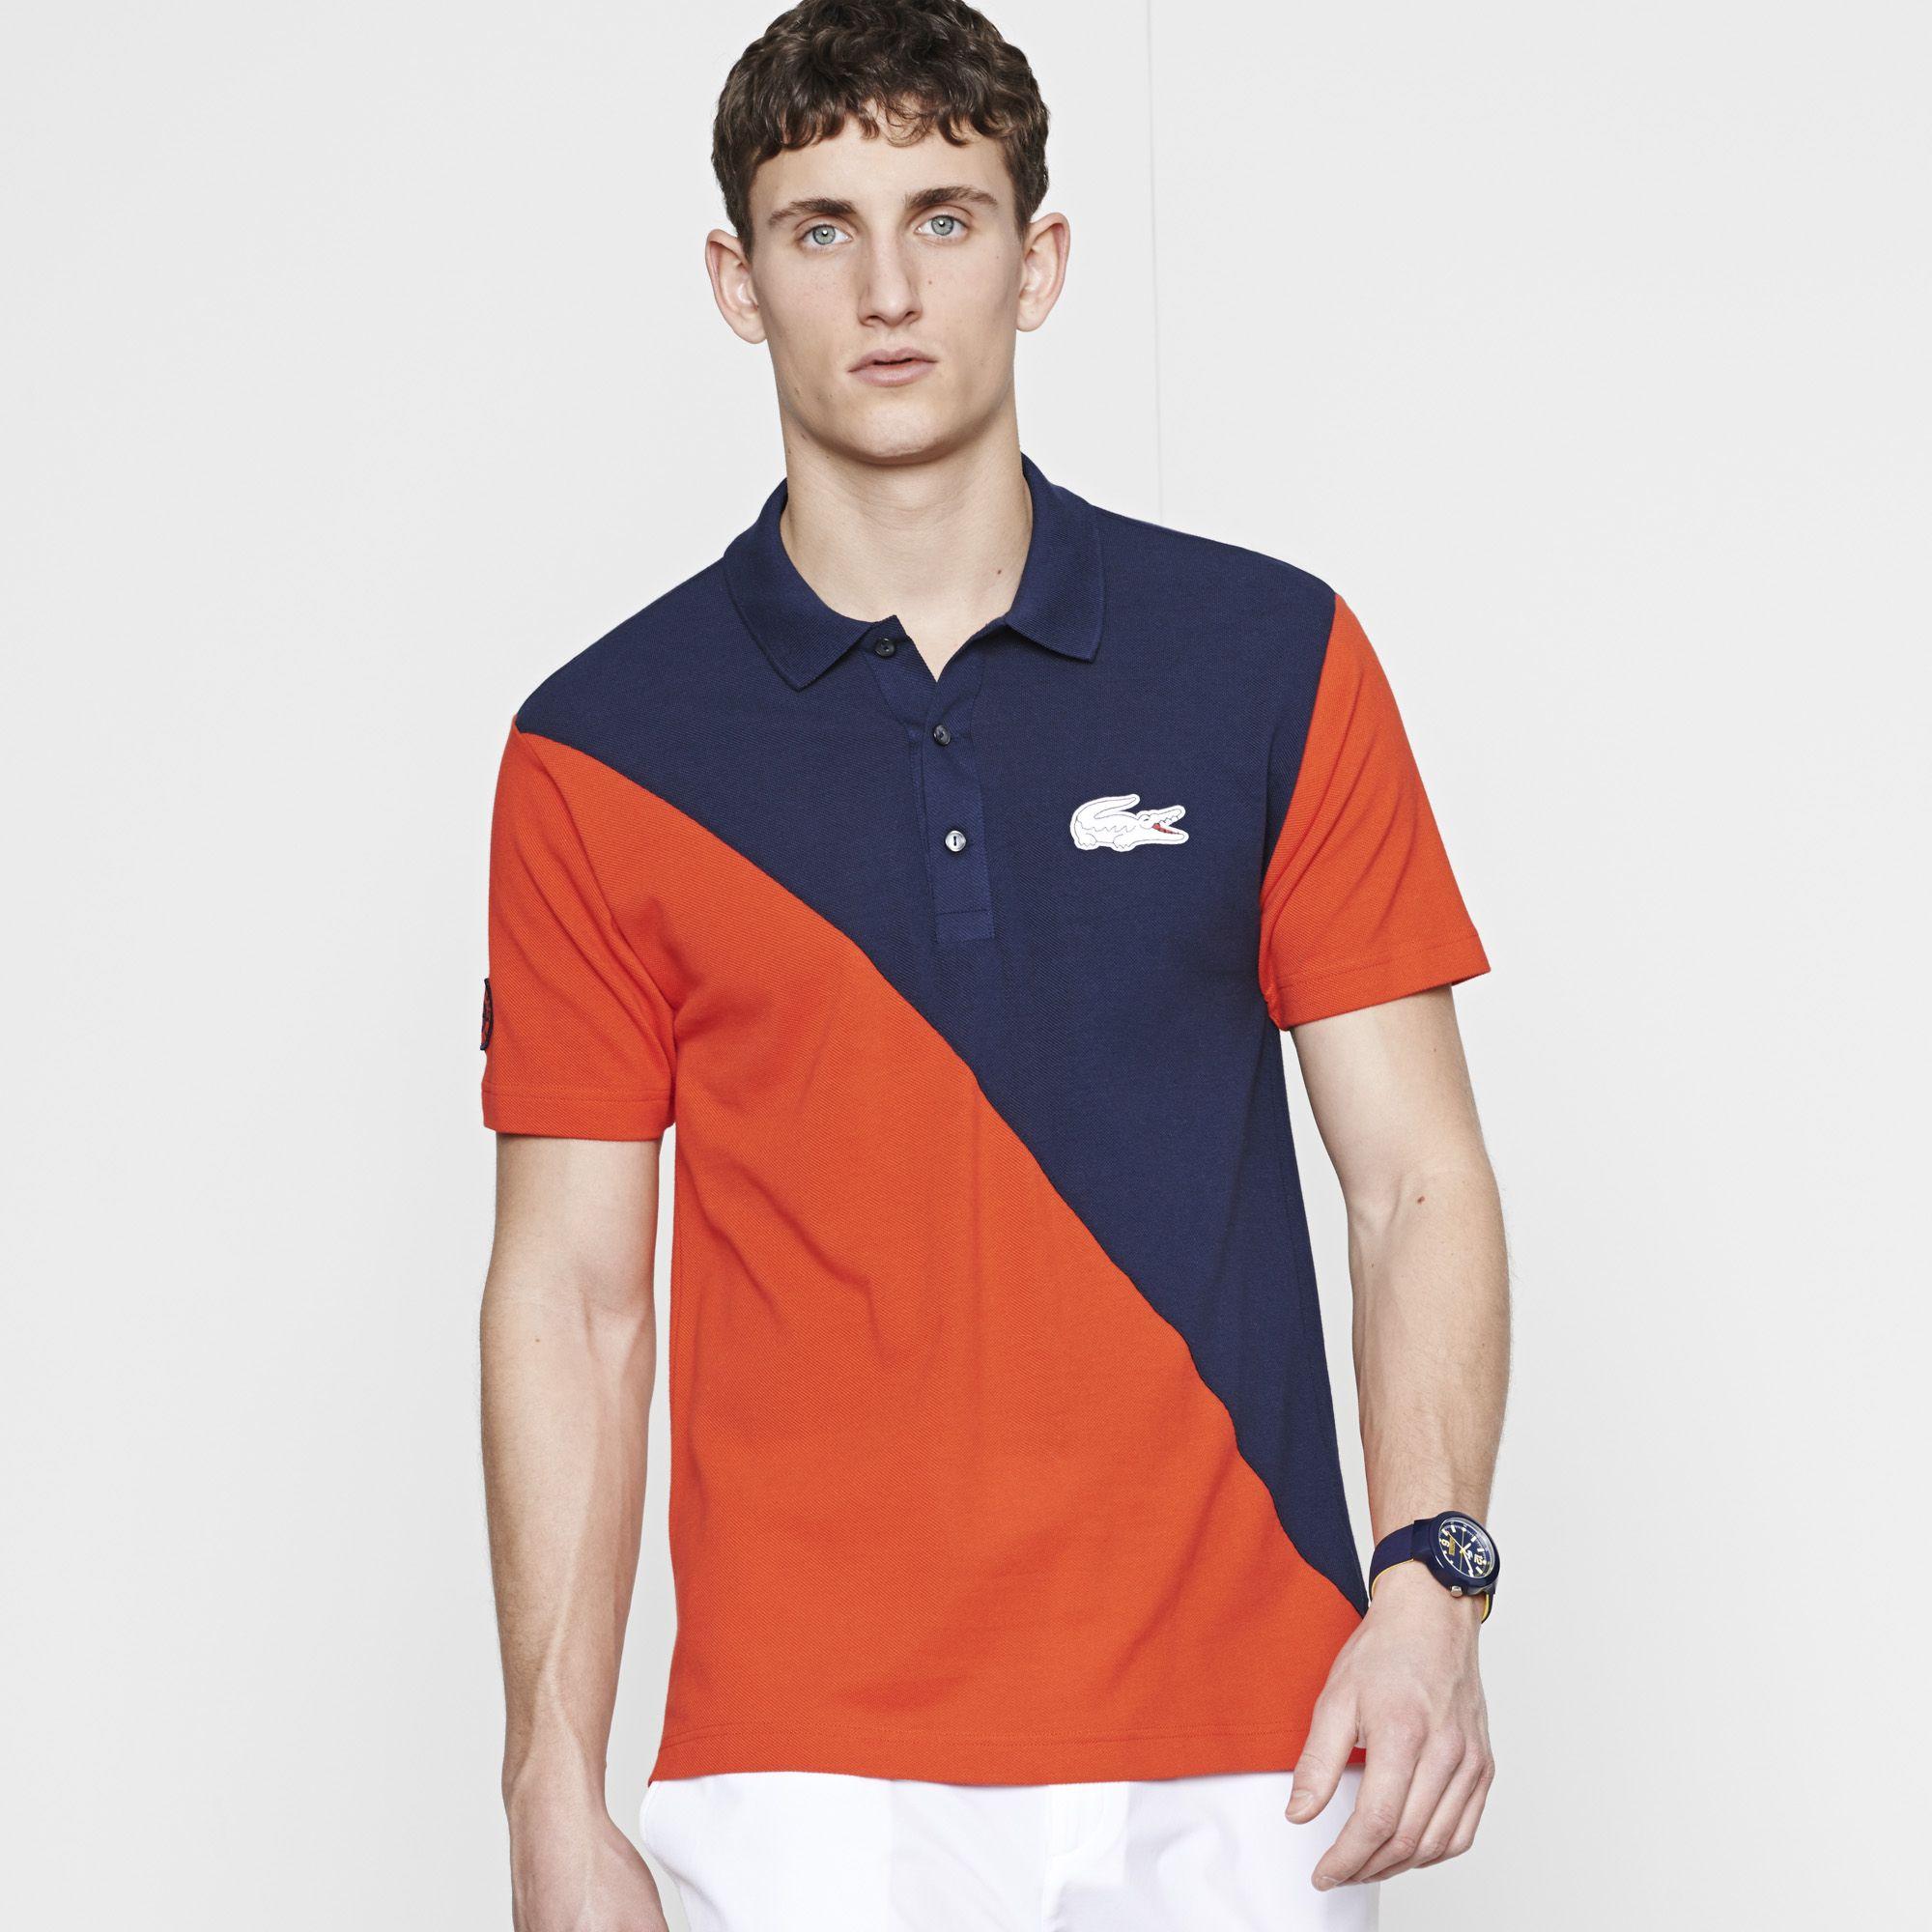 fb9f314d3 Polo Lacoste Sport uni Edition Roland Garros - ETNA/MARINE   LACOSTE ...